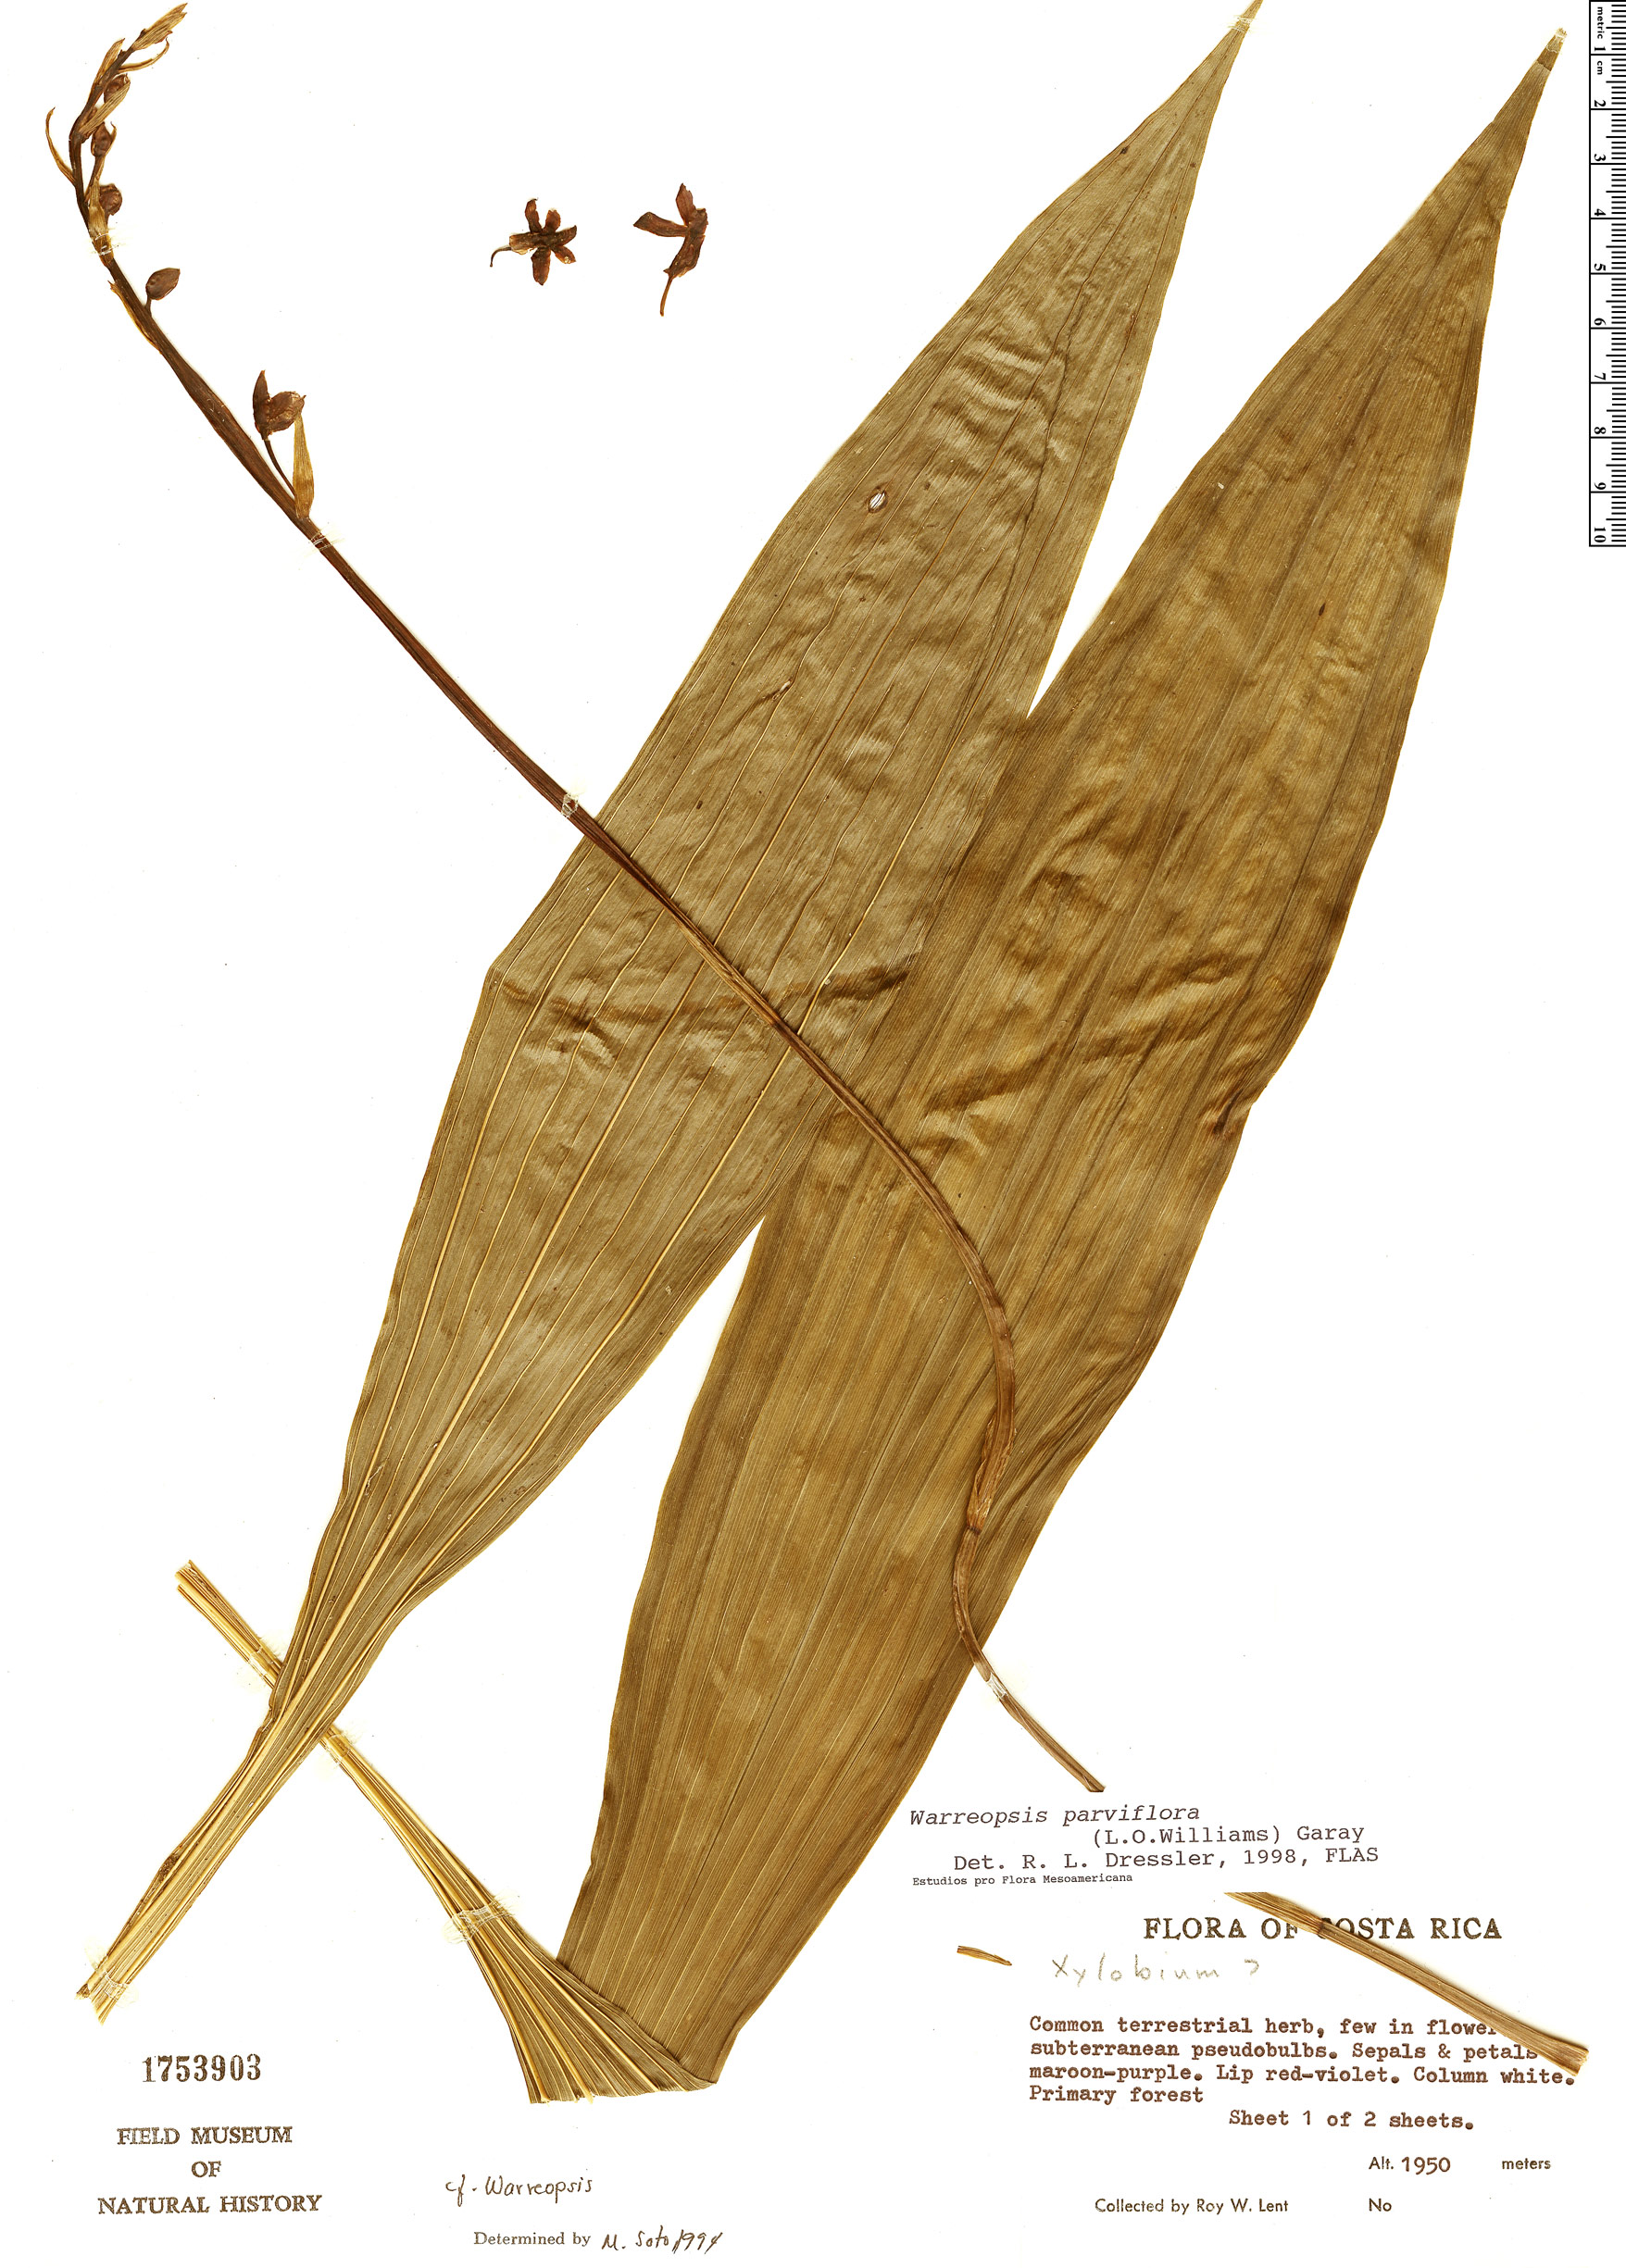 Specimen: Warreopsis parviflora